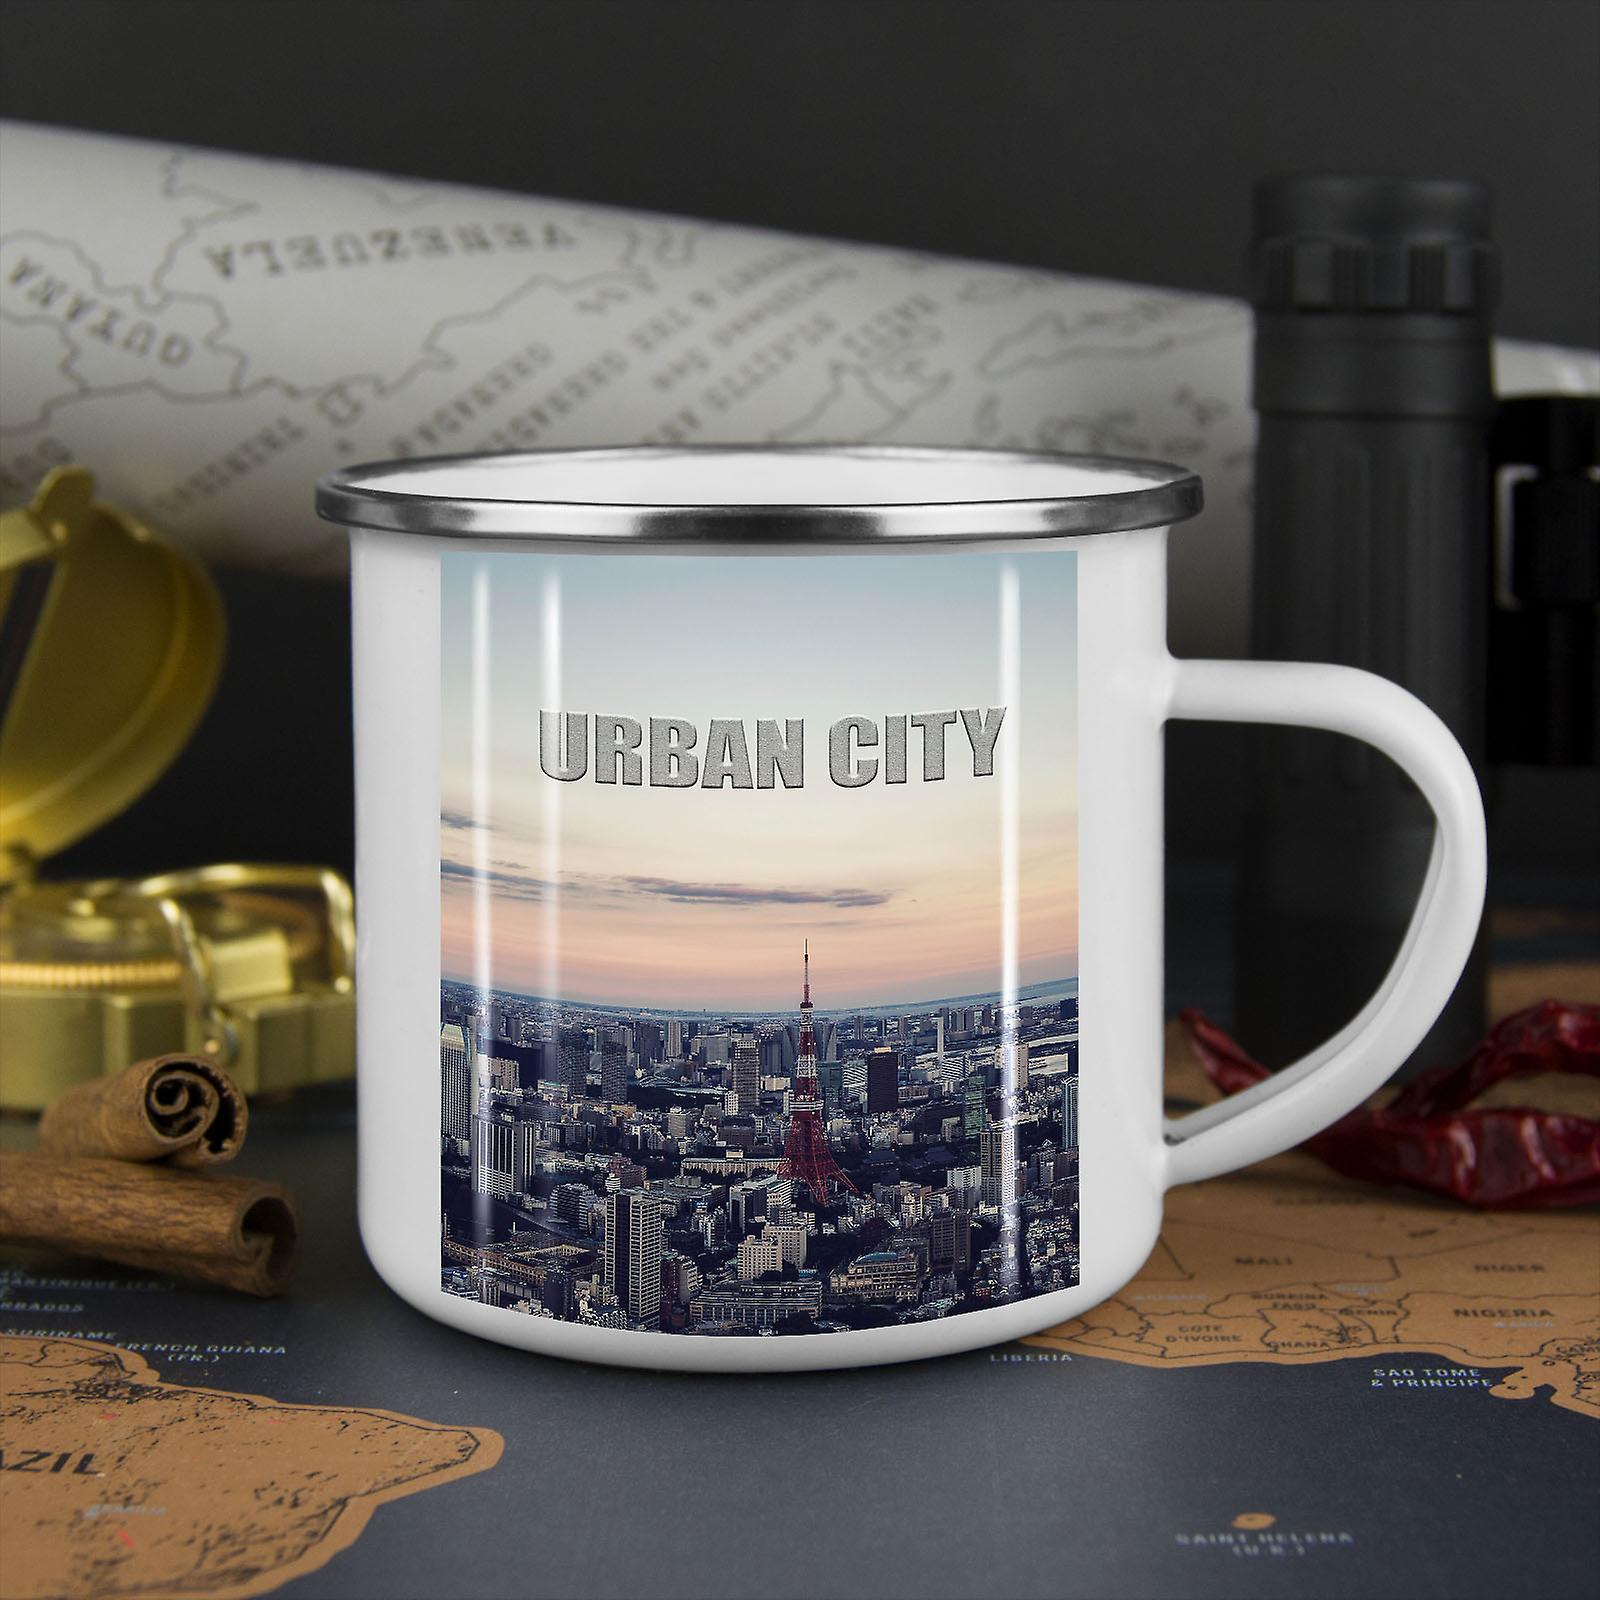 Stadtstraße Mode neue WhiteTea Kaffee Emaille Mug10 oz | Wellcoda